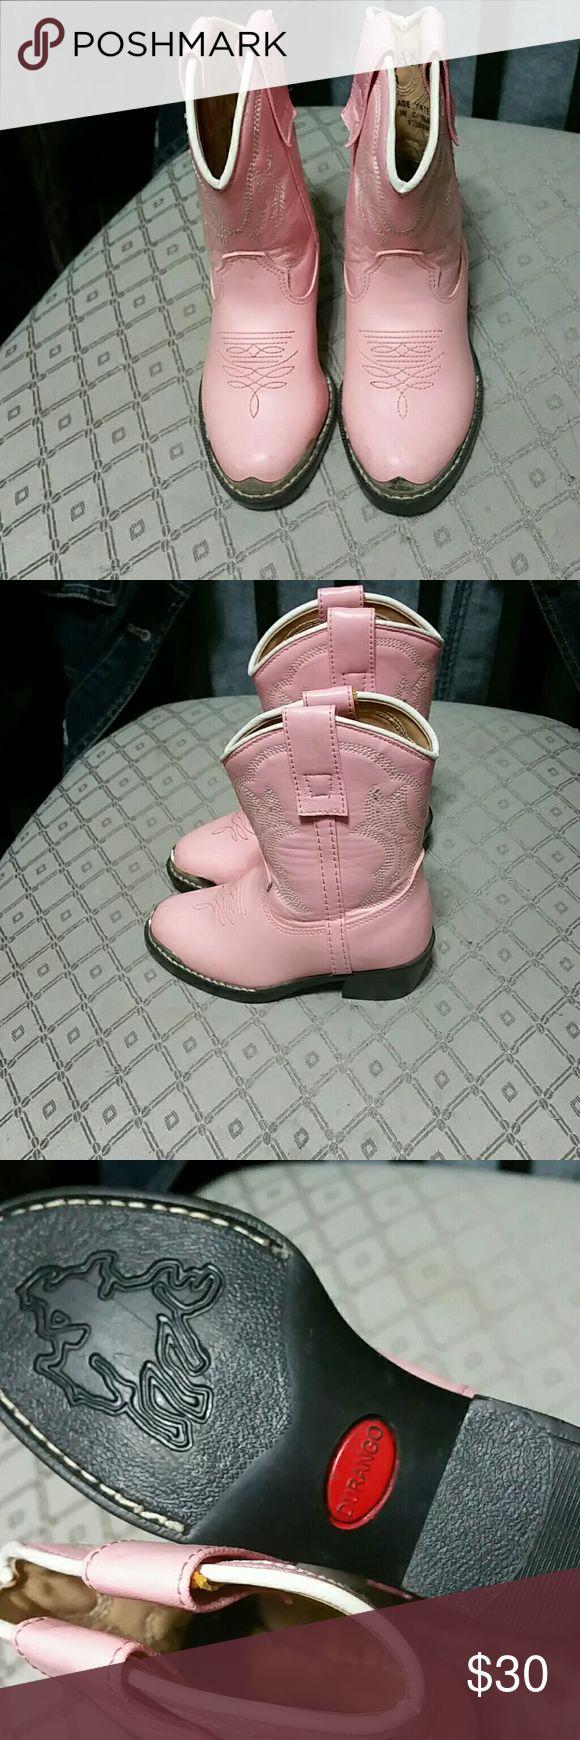 Durango boots Adorable.?? little girls Durango boots Durango Shoes Boots